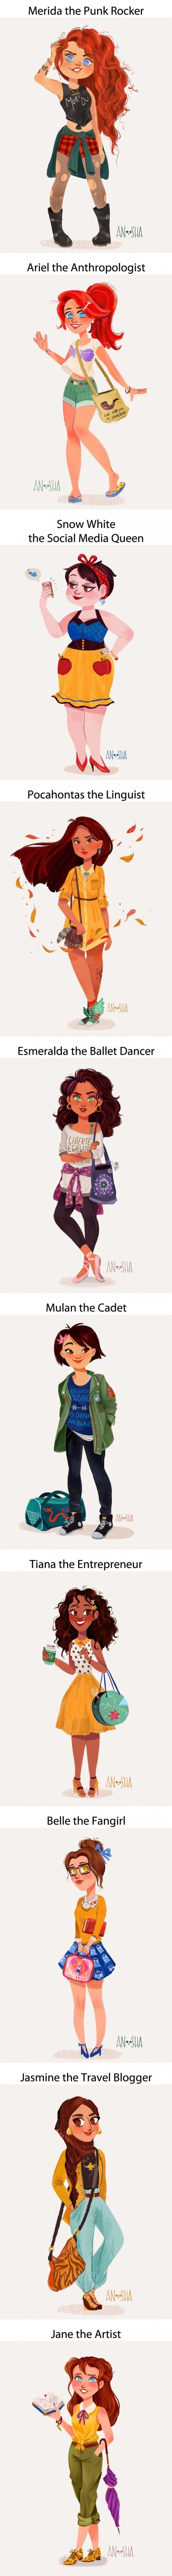 Modern Day Disney Girls. Check out Merida, Ariel, Snow White, Pocahontas,  Esmeralda, Mulan, Tiana, Belle, Jasmine and Jane looking hip for the 21st century.  Disney fan art.